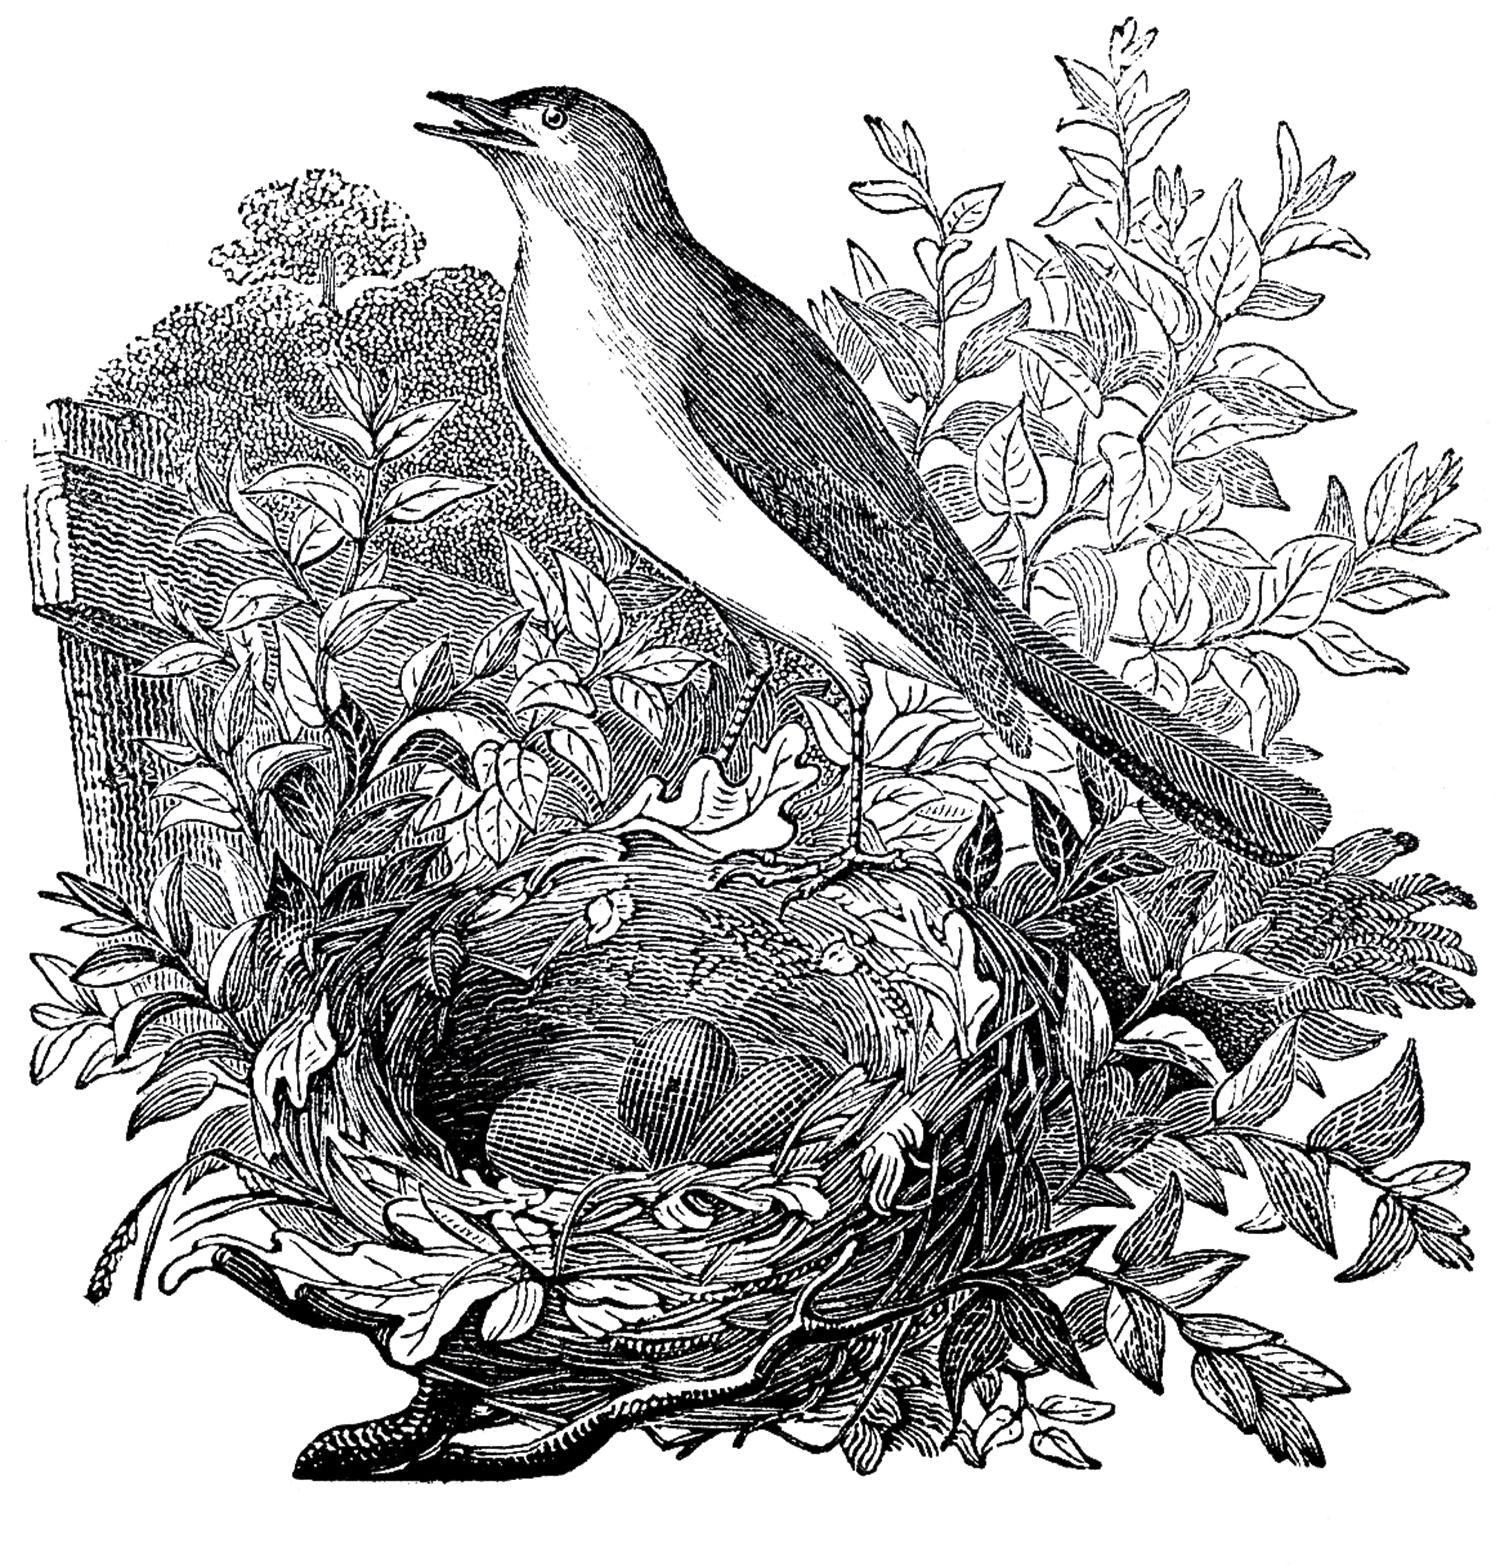 Free Vintage Nightingale Images The Graphics Fairy